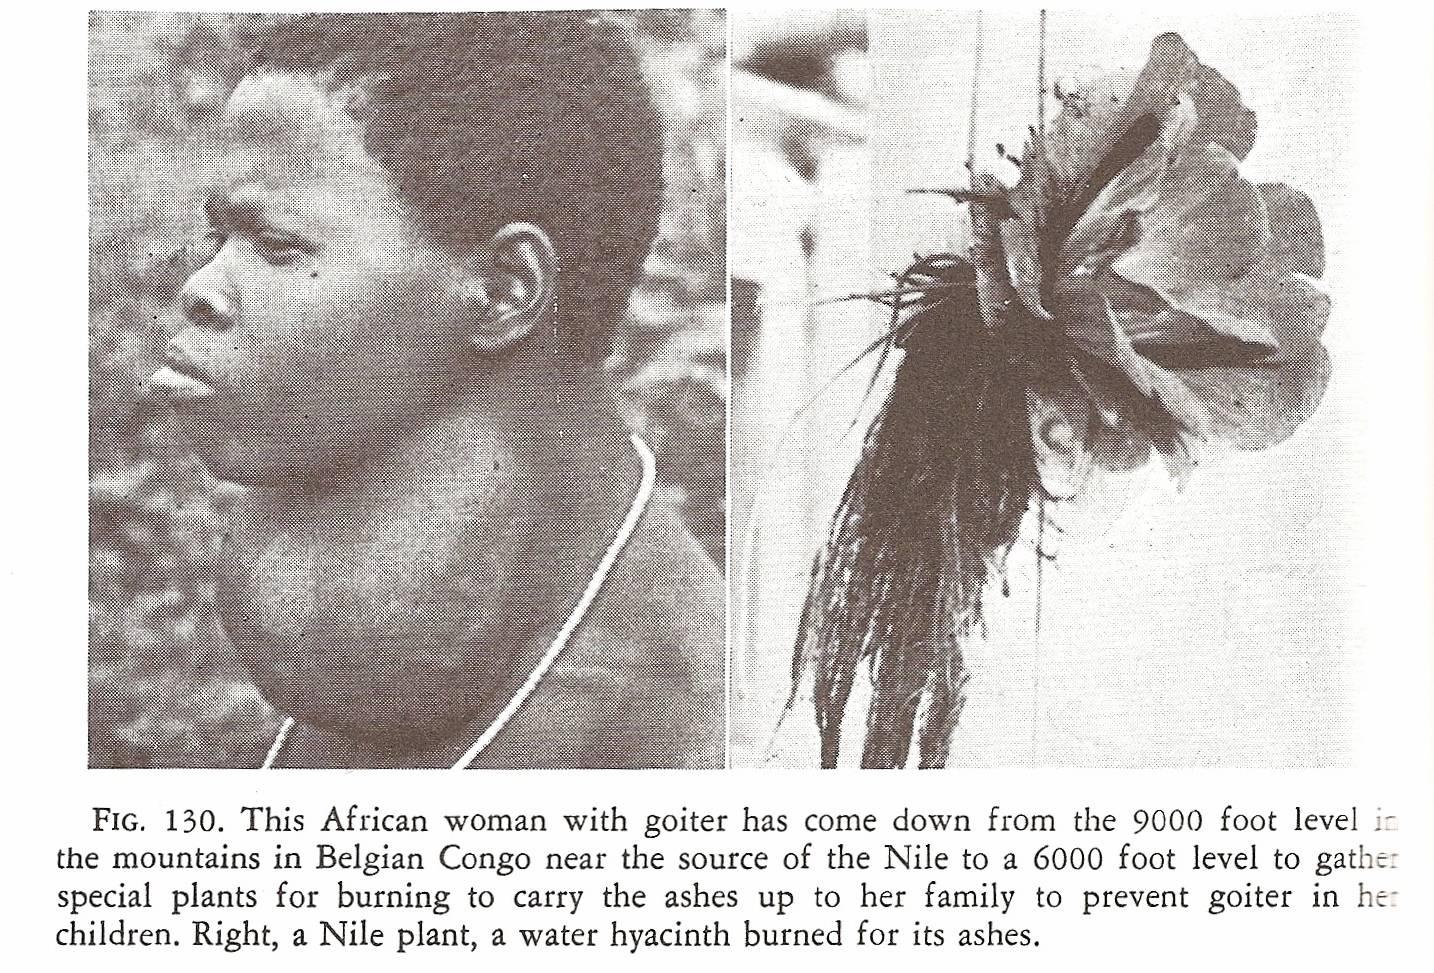 Weston Price Africa Goitre